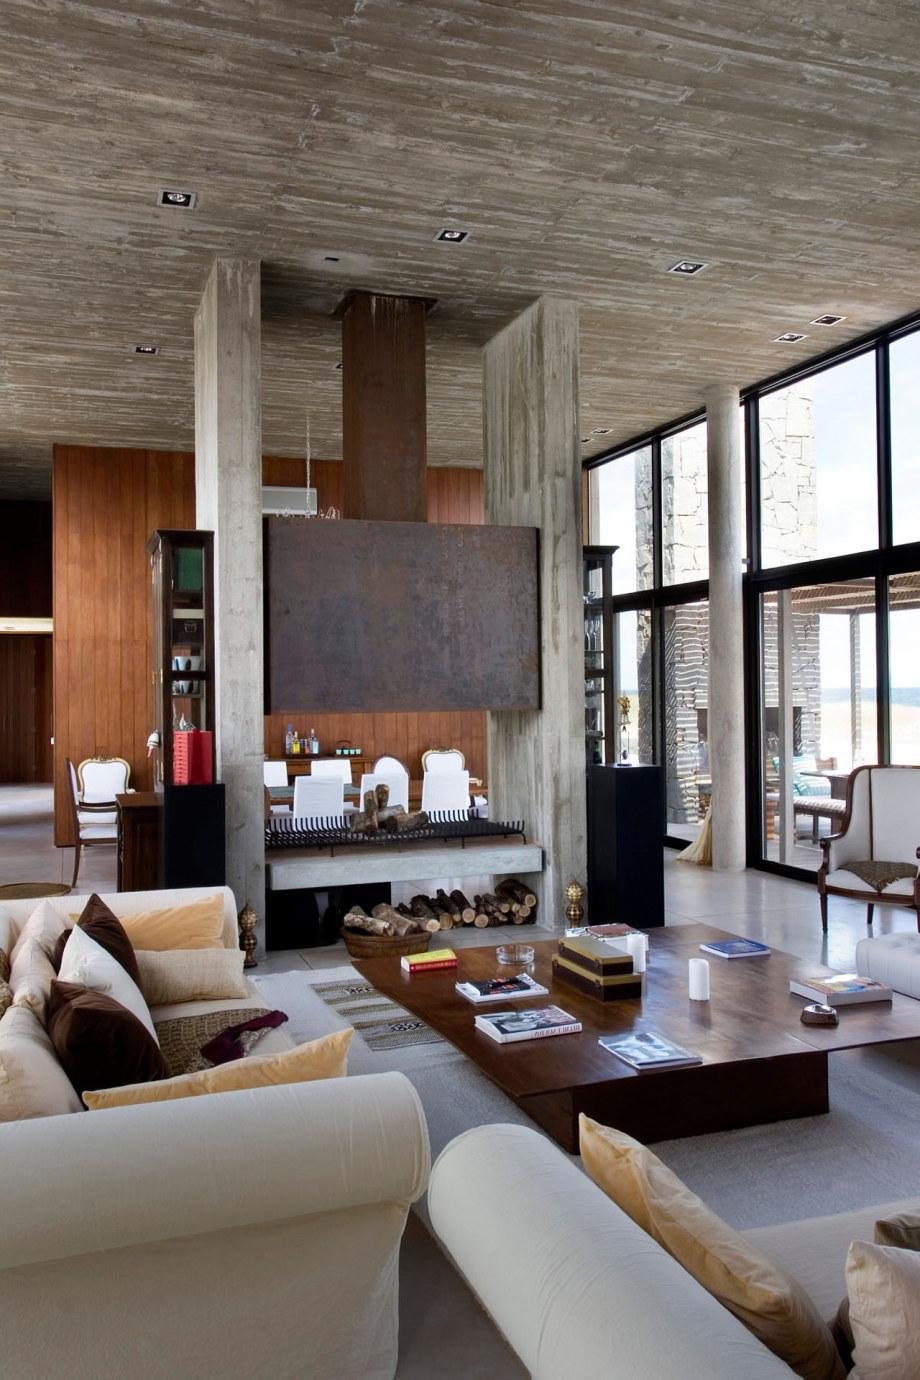 The beach house La Boyita Residence by Martin Gomez Arguitectos, Uruguay 17